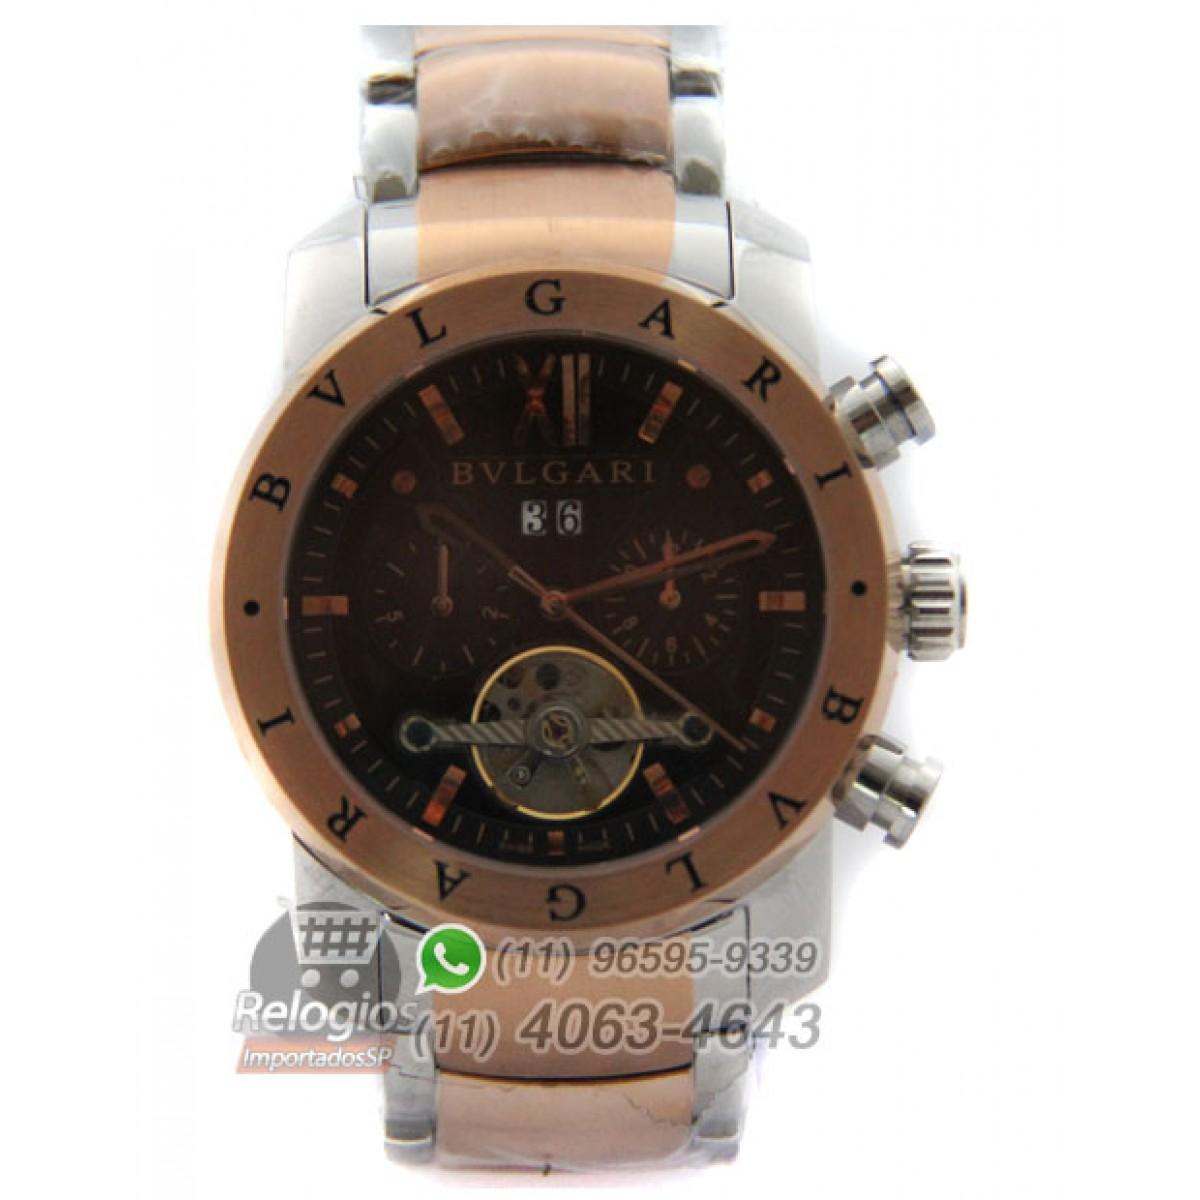 Relógio Réplica Bulgari Homem de Ferro Rosê New Limited 86b4802c97